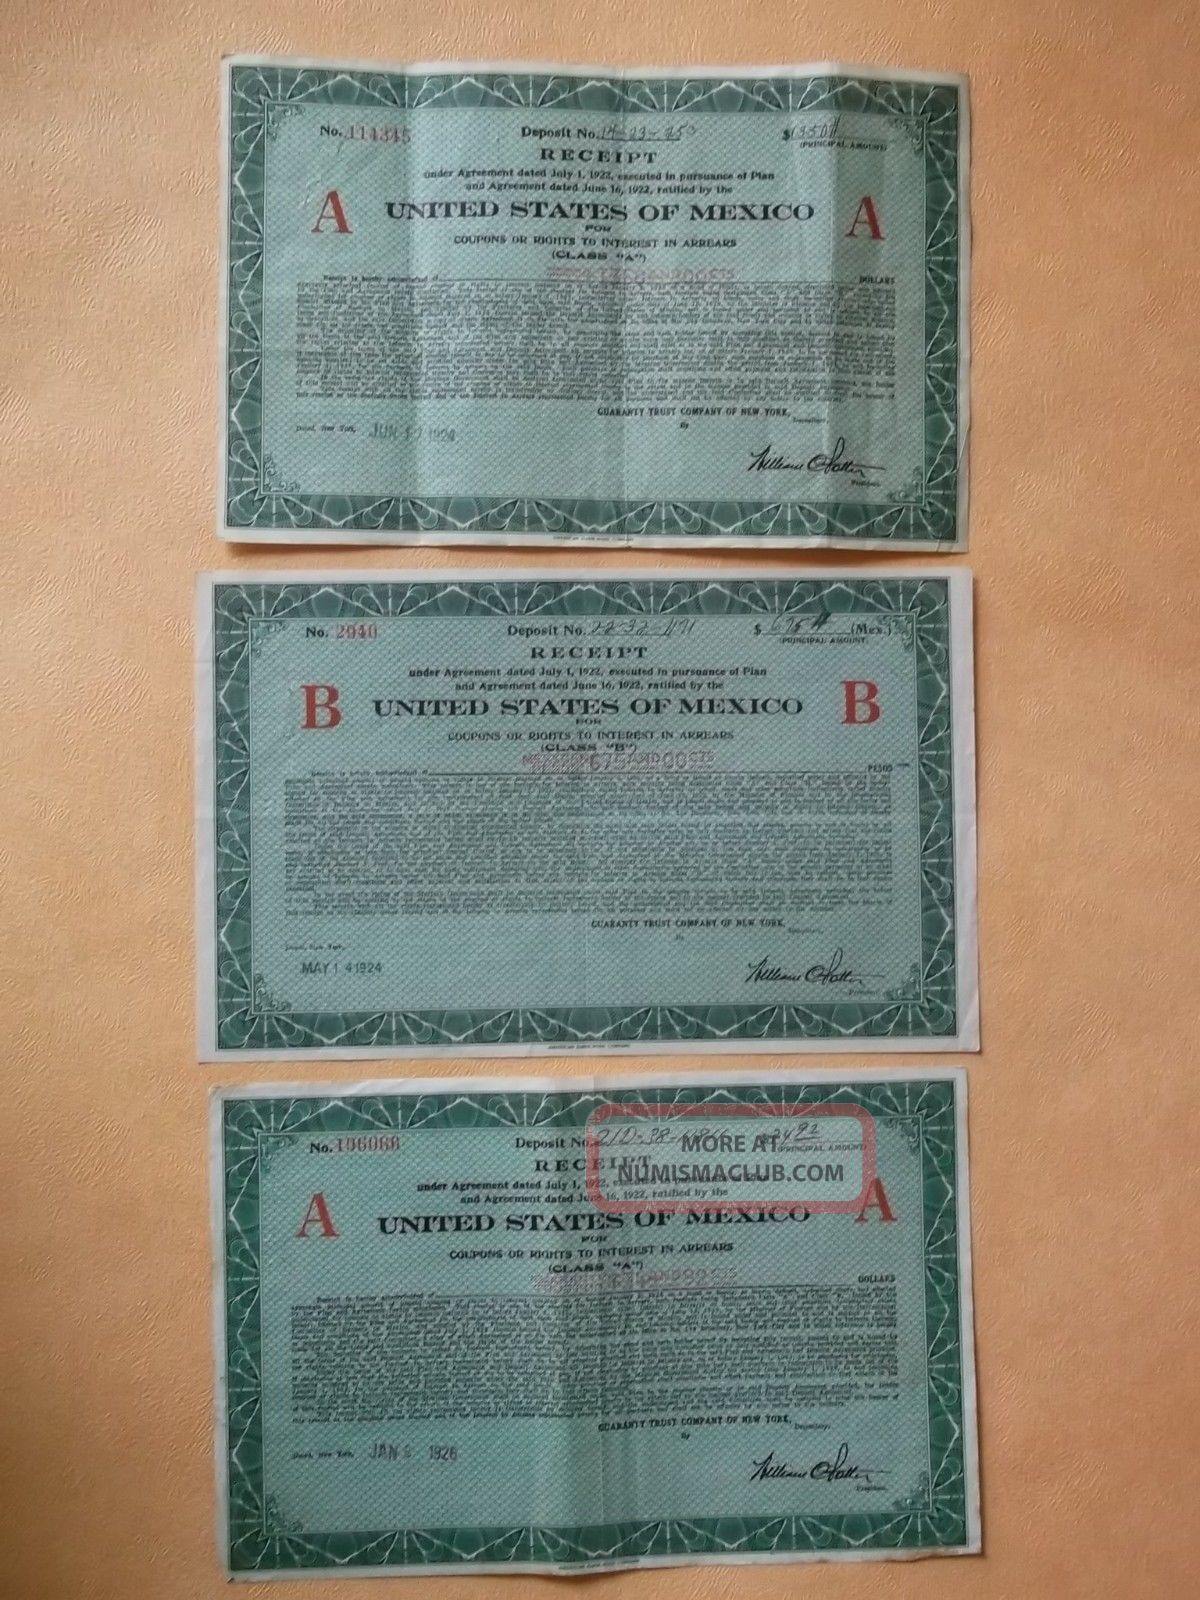 Mexico 3 X Receipt $34,  $675,  $1350 Guaranty Trust Cy Of N.  York World photo